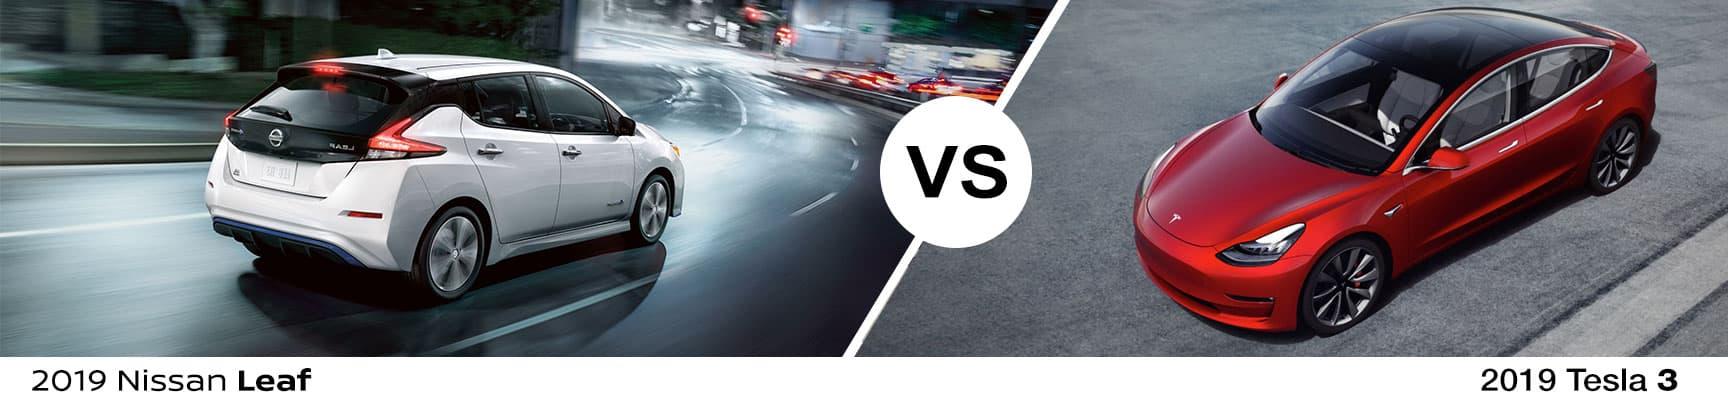 2019 Nissan Leaf vs 2019 Telsa 3